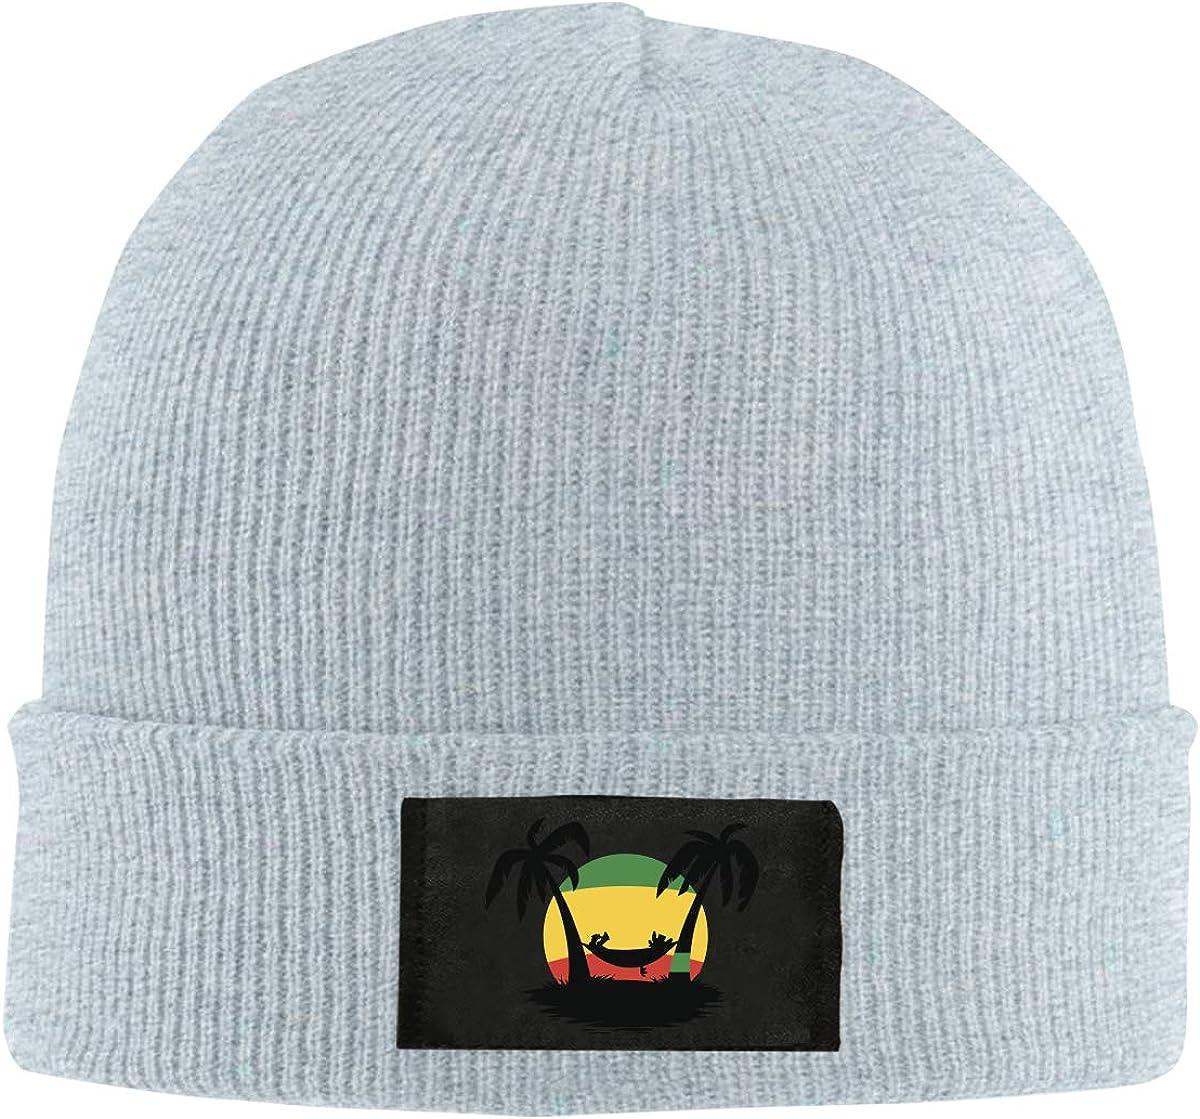 100/% Acrylic Winter Skull Cap BF5Y6z/&MA Unisex Jamaica Rasta Flag Coconut Tree Knitted Cap